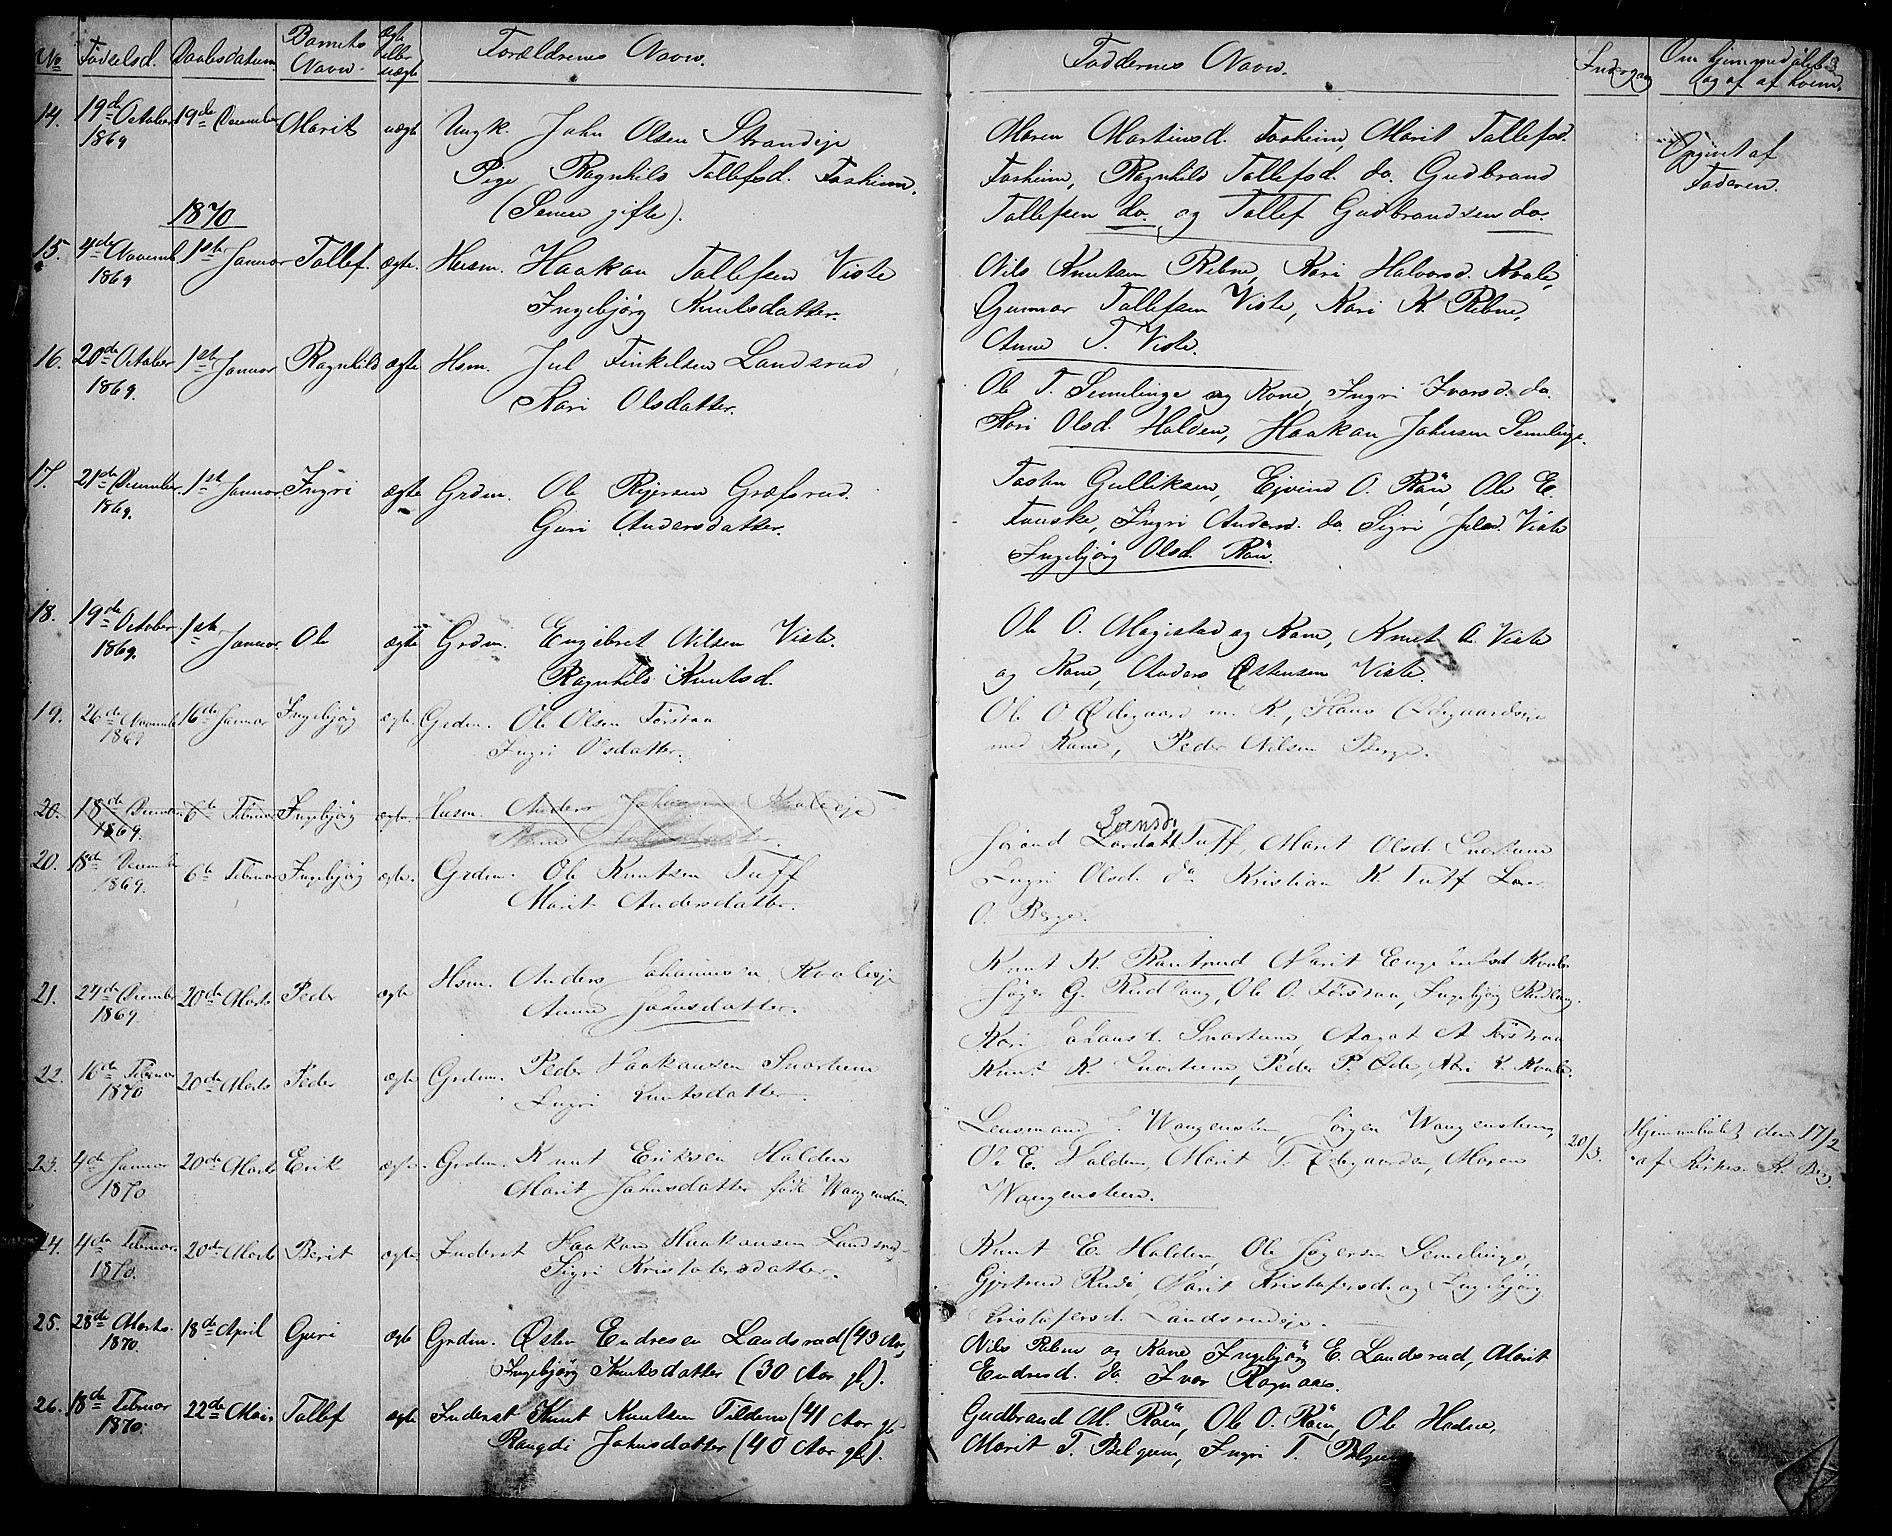 SAH, Vestre Slidre prestekontor, Klokkerbok nr. 3, 1869-1882, s. 3